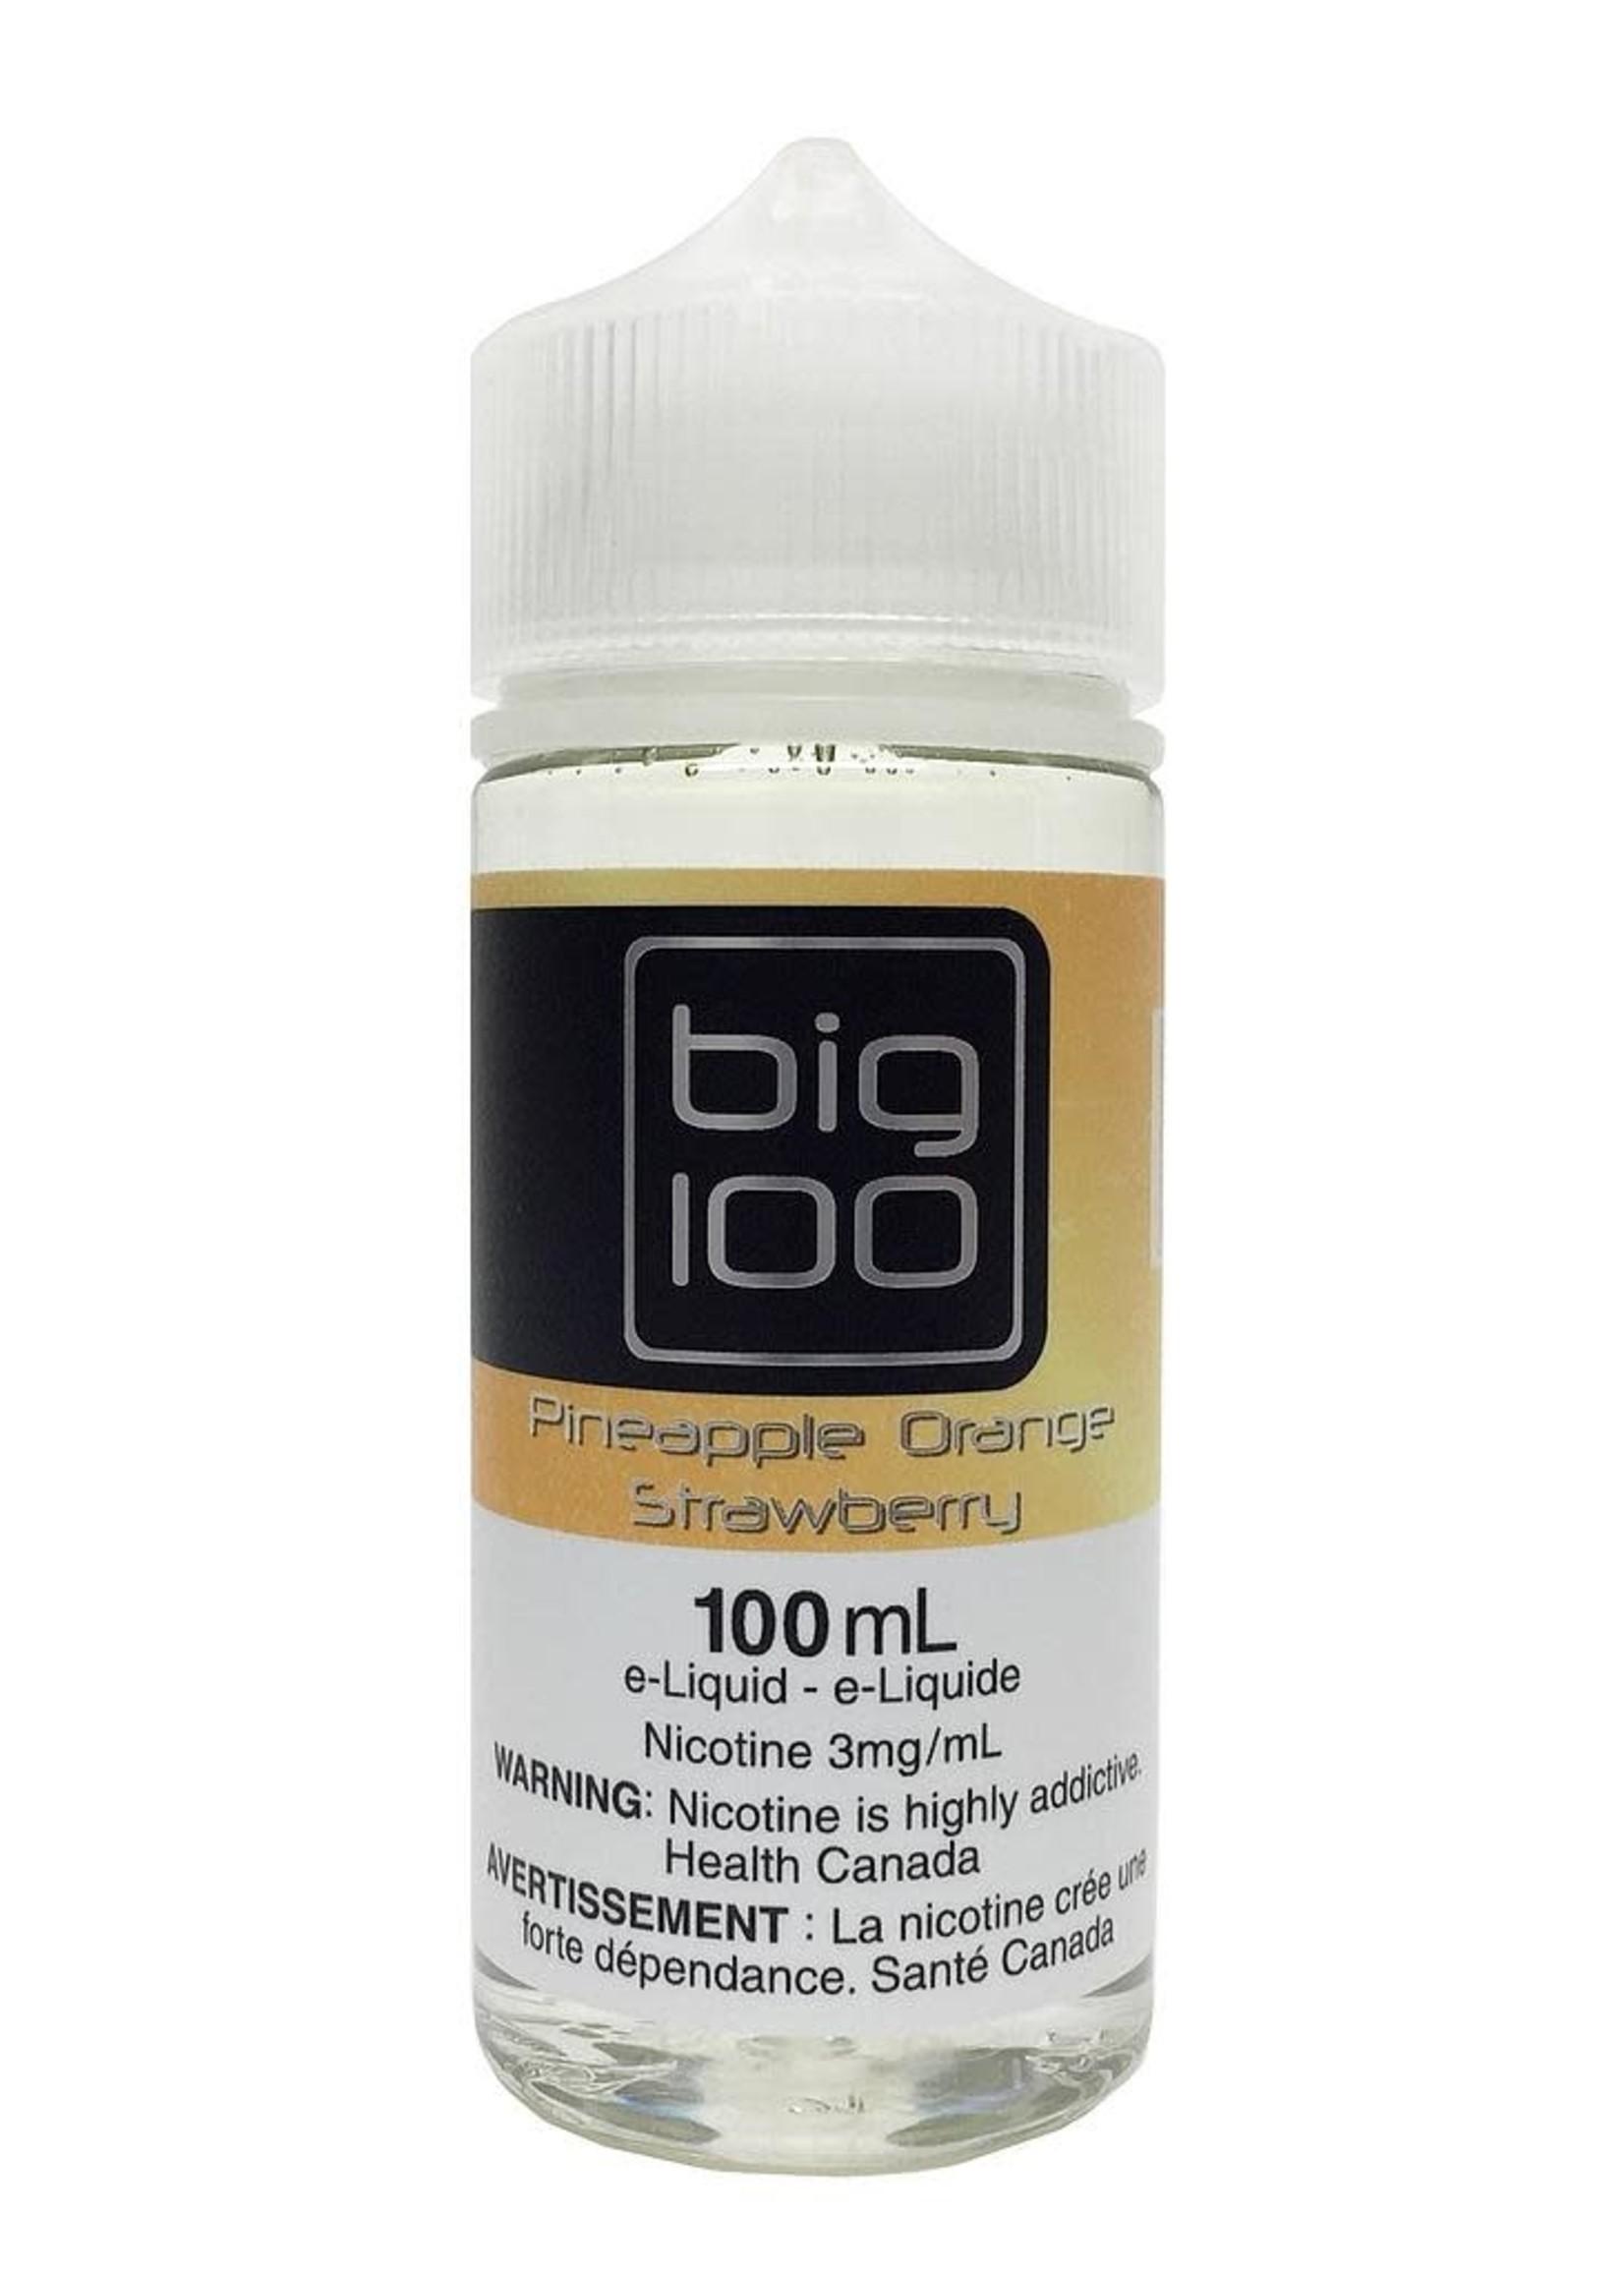 Big 100 Pineapple  Orange Strawberry